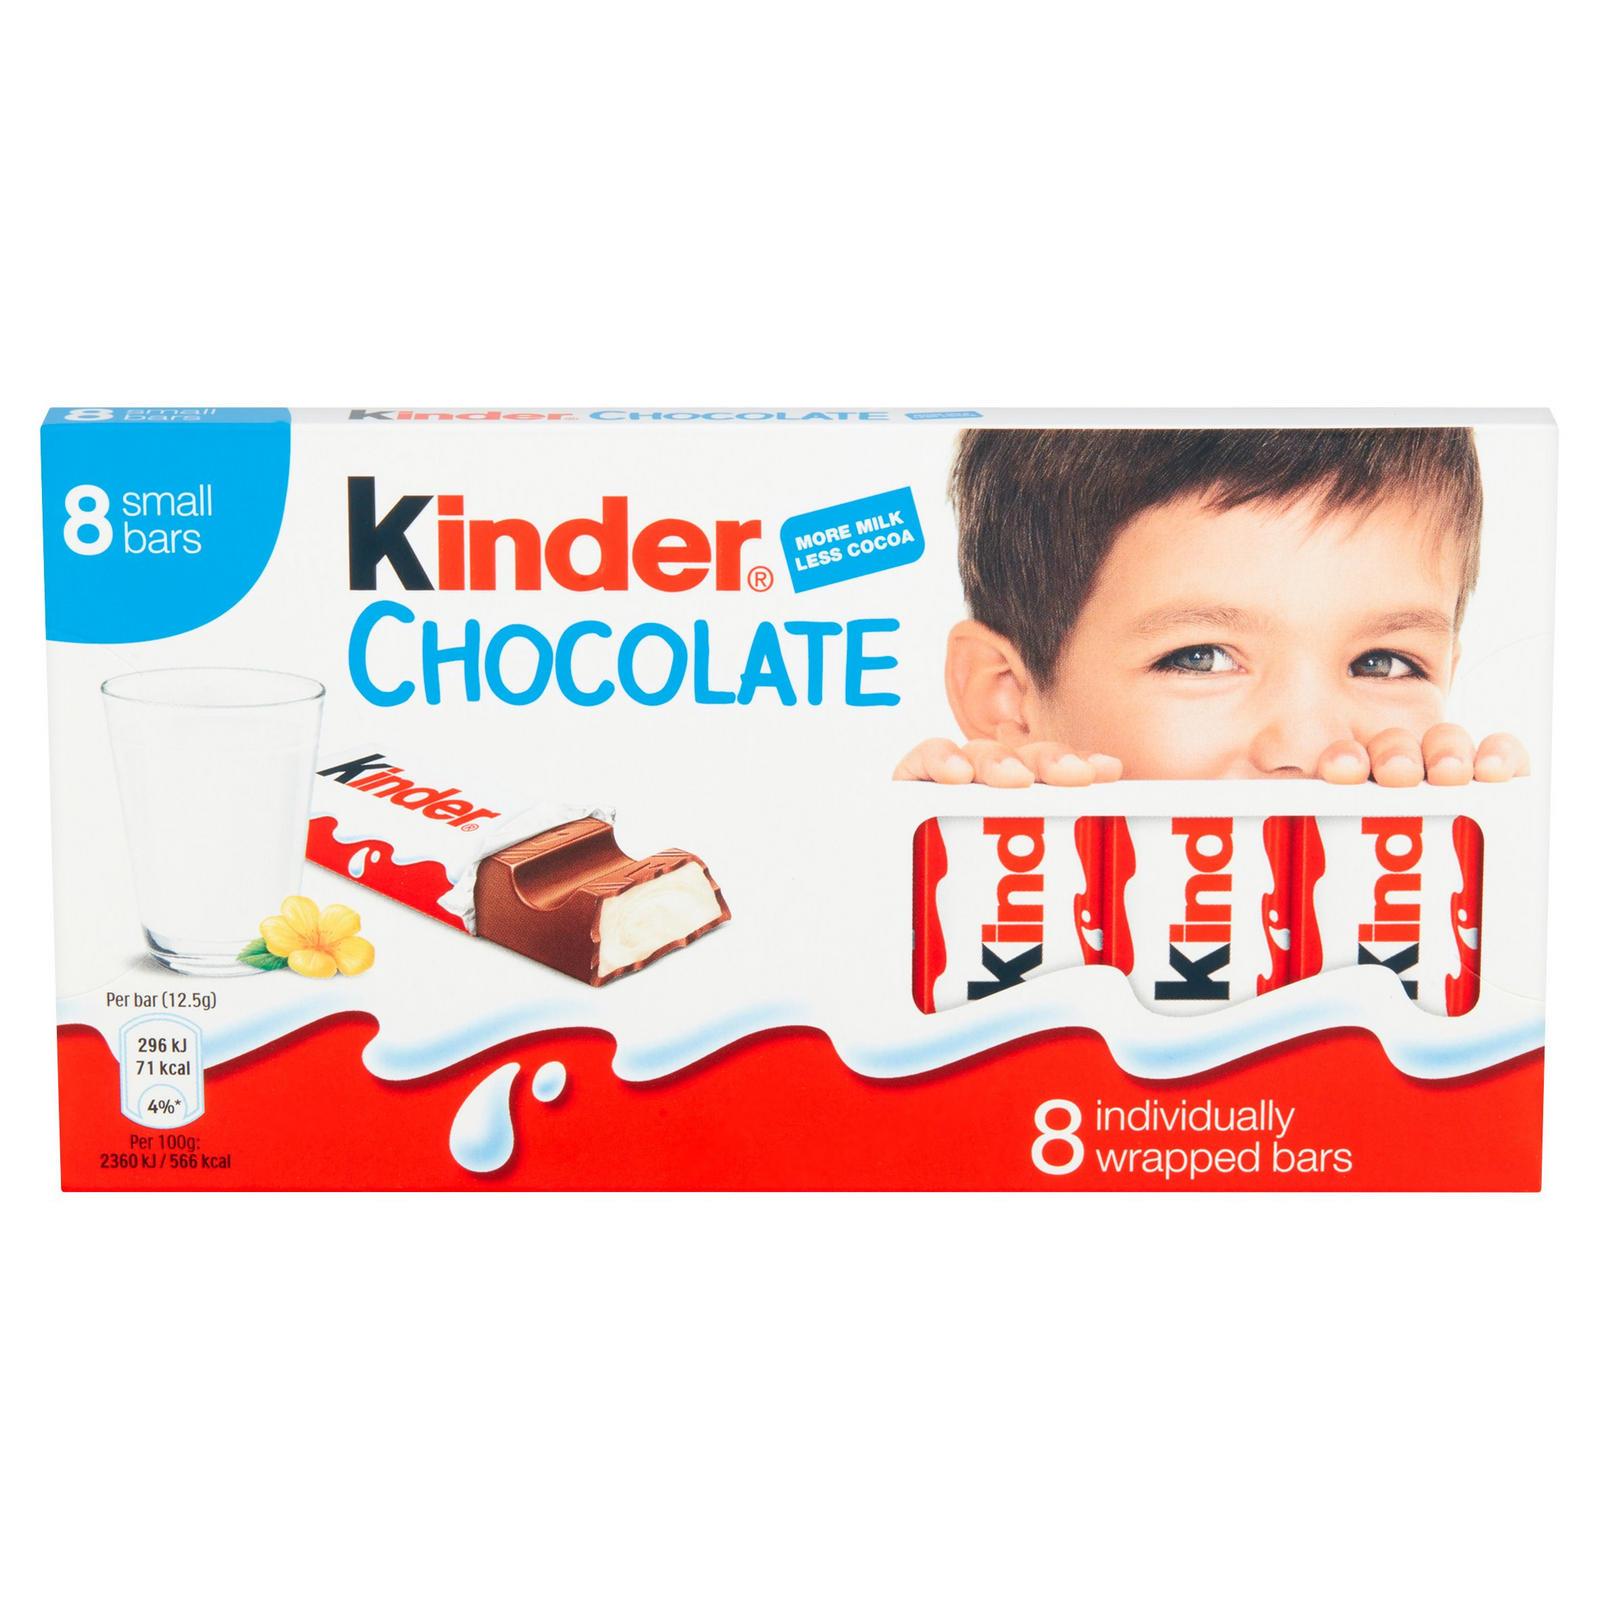 Kinder Chocolate Small Bars (8 Pack) - £1.20 Prime / +£4.49 non Prime (£1.14 S&S) @ Amazon